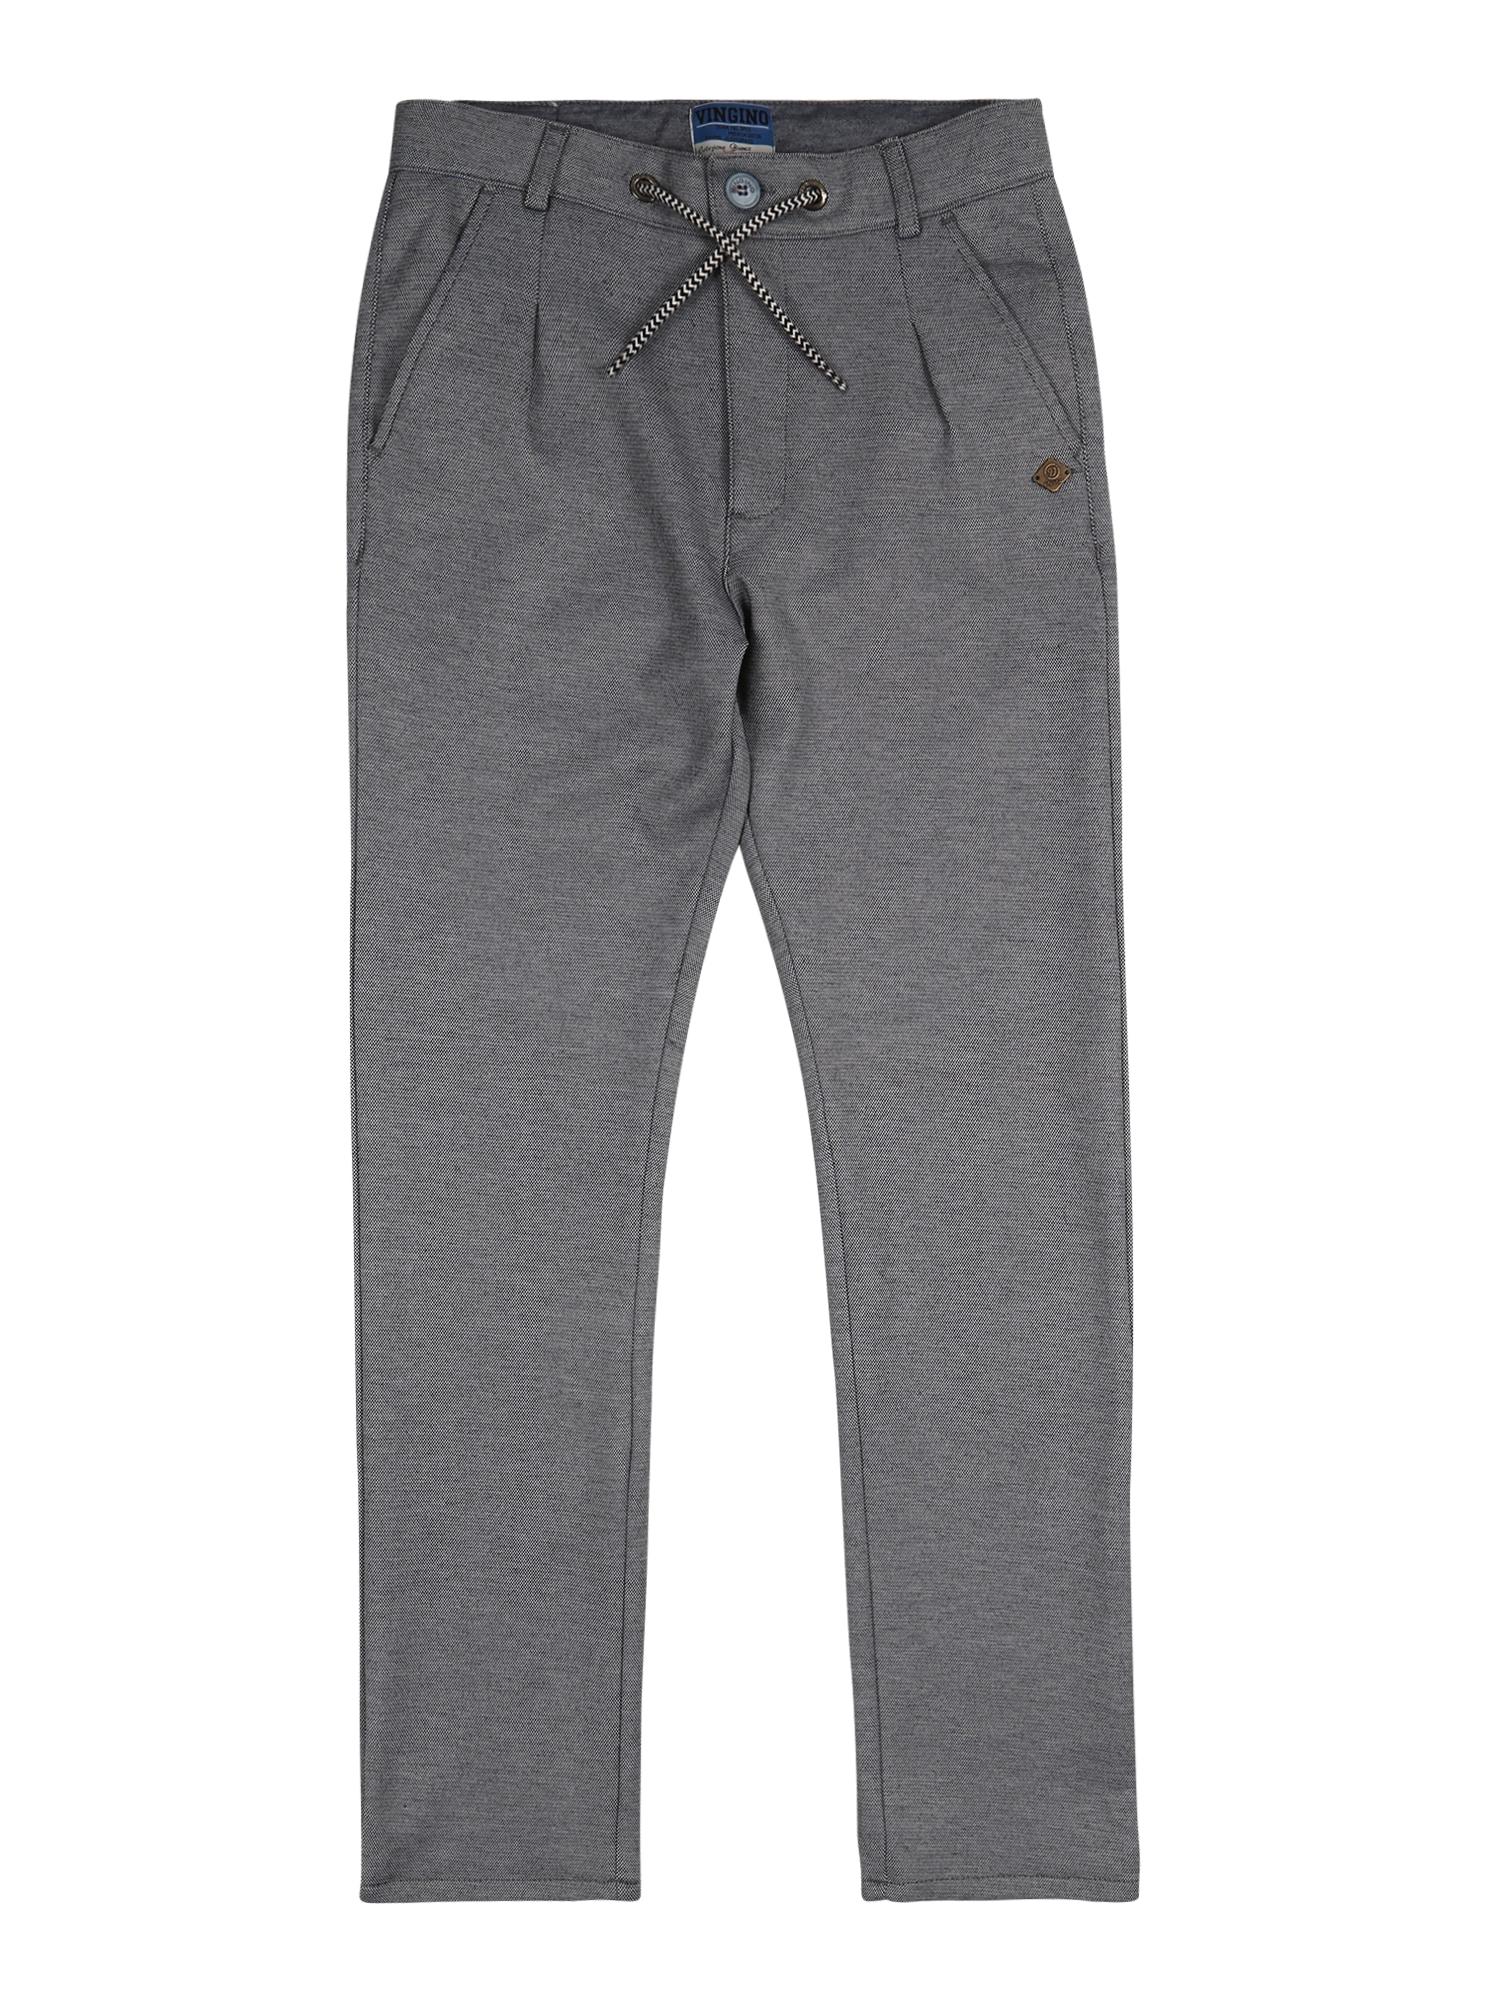 VINGINO Kelnės 'Saibo' margai pilka